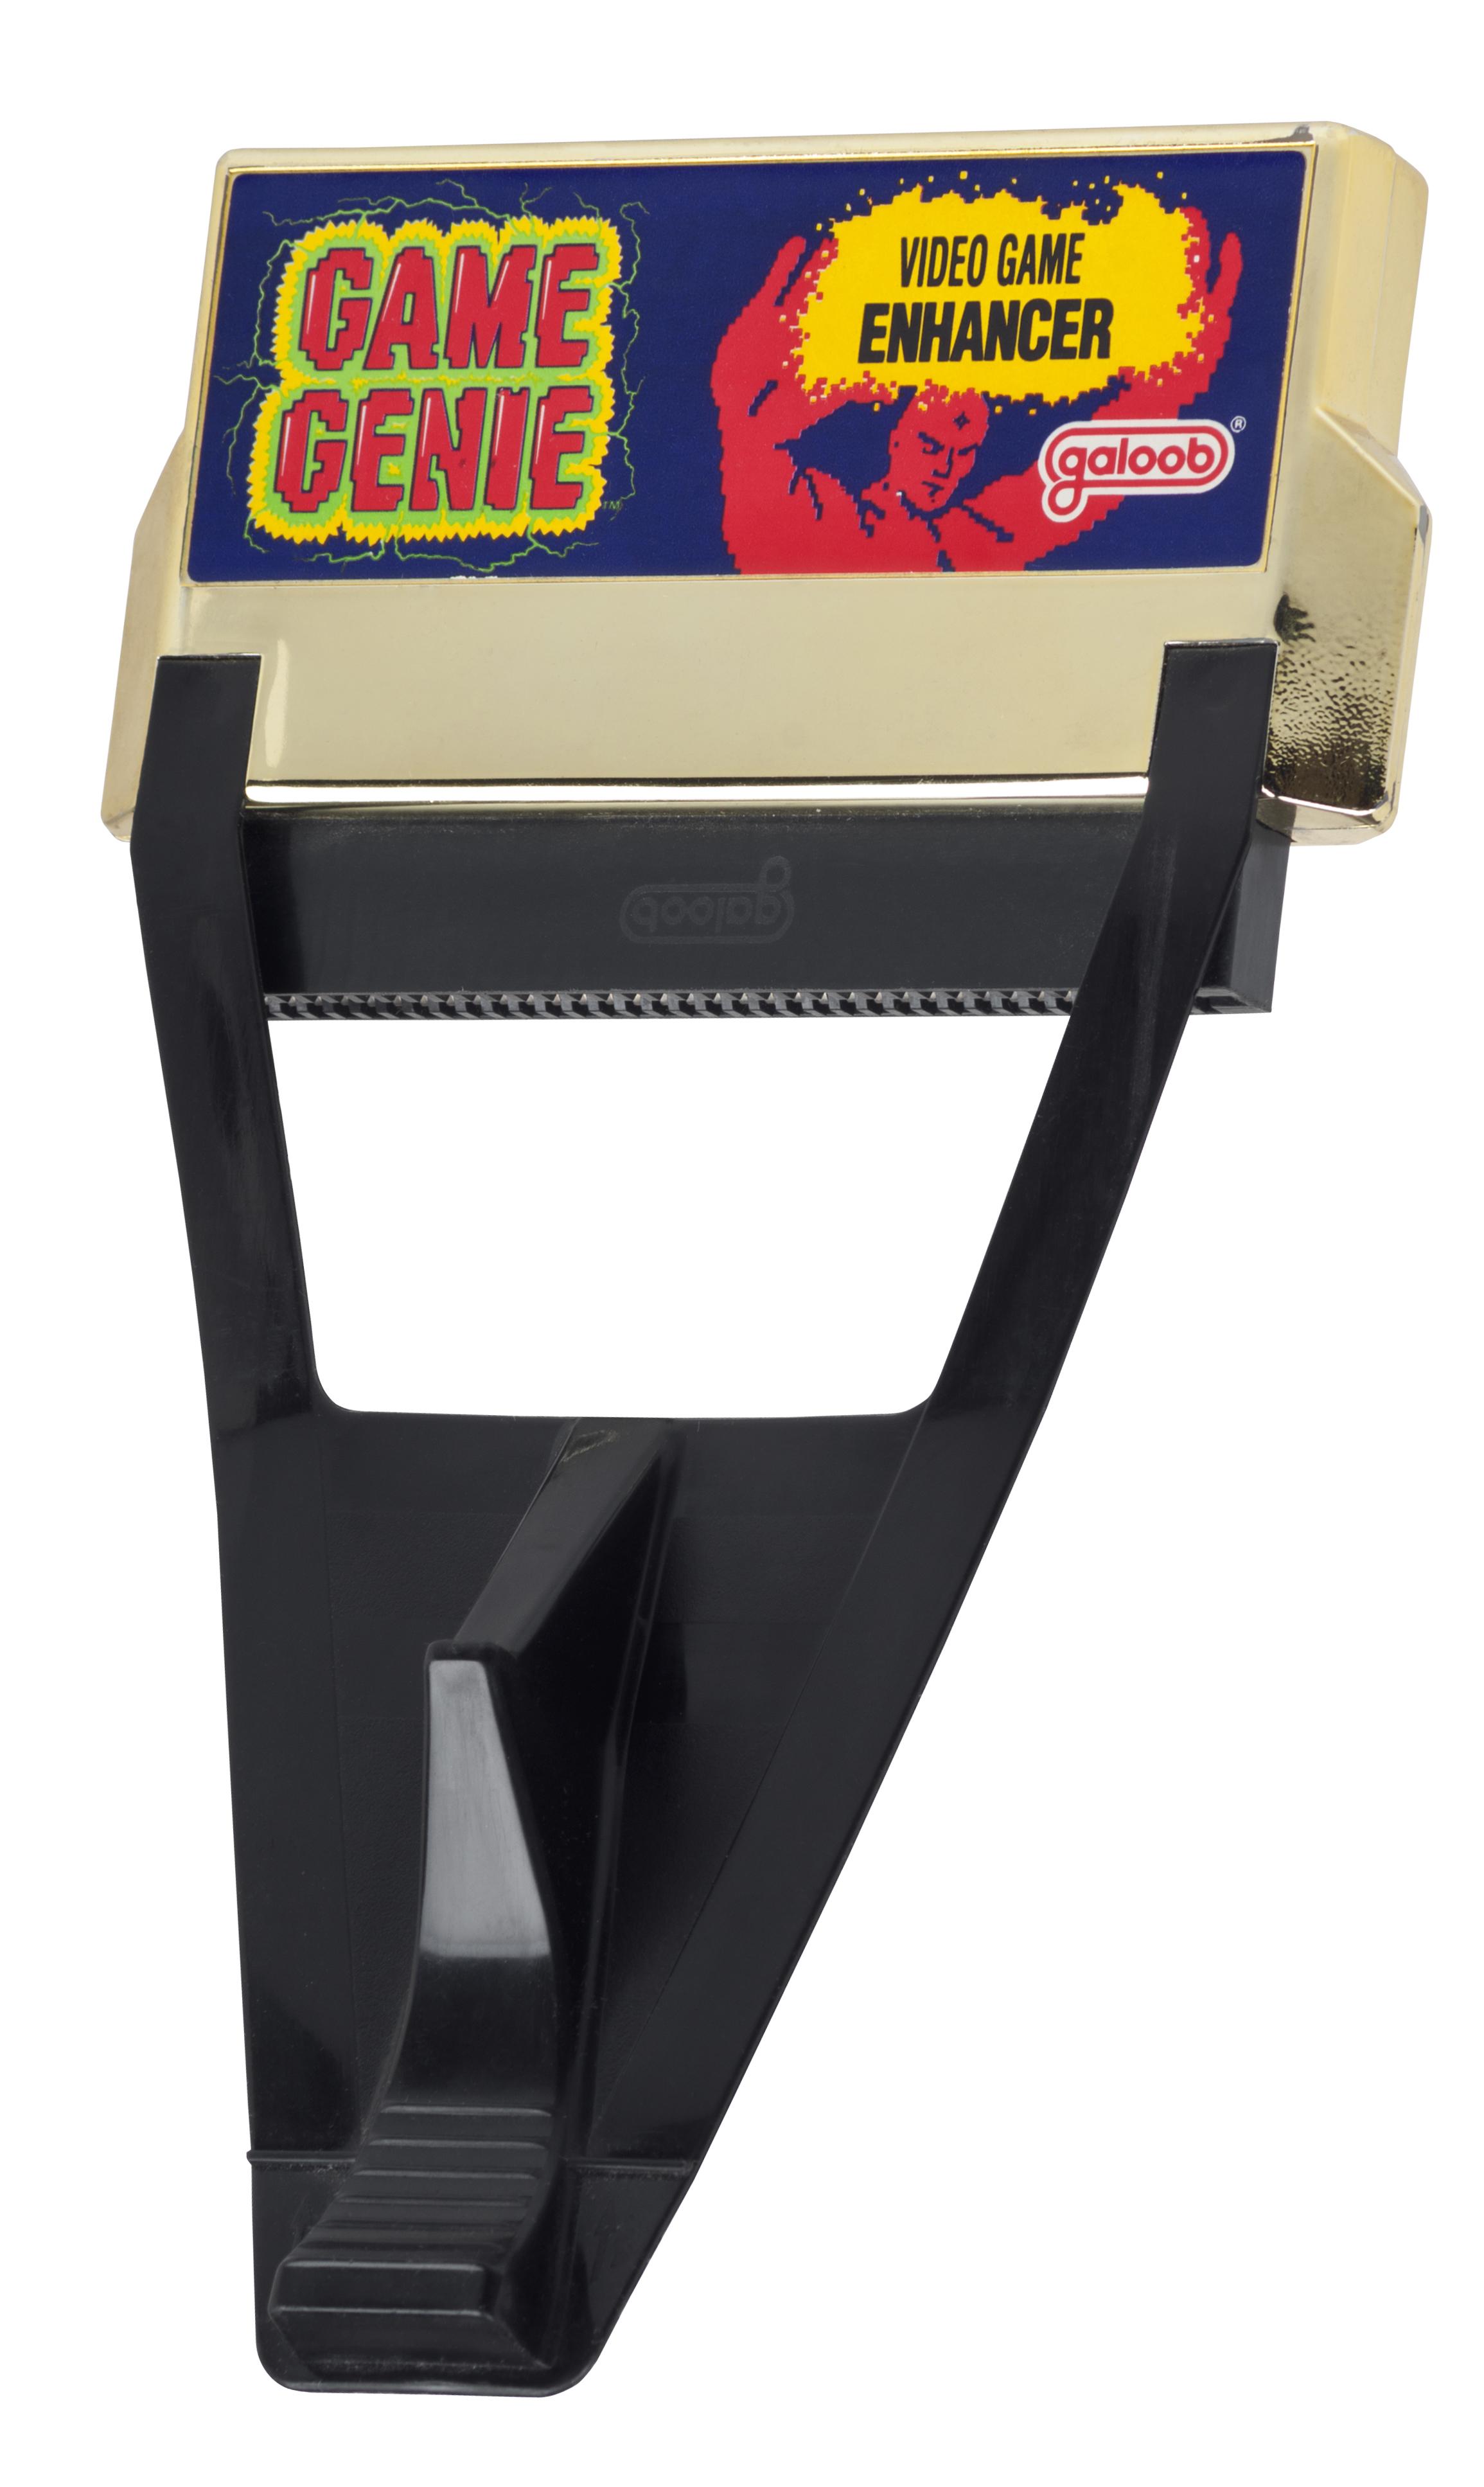 Game boy color game genie codes - Game Boy Color Game Genie Codes 30